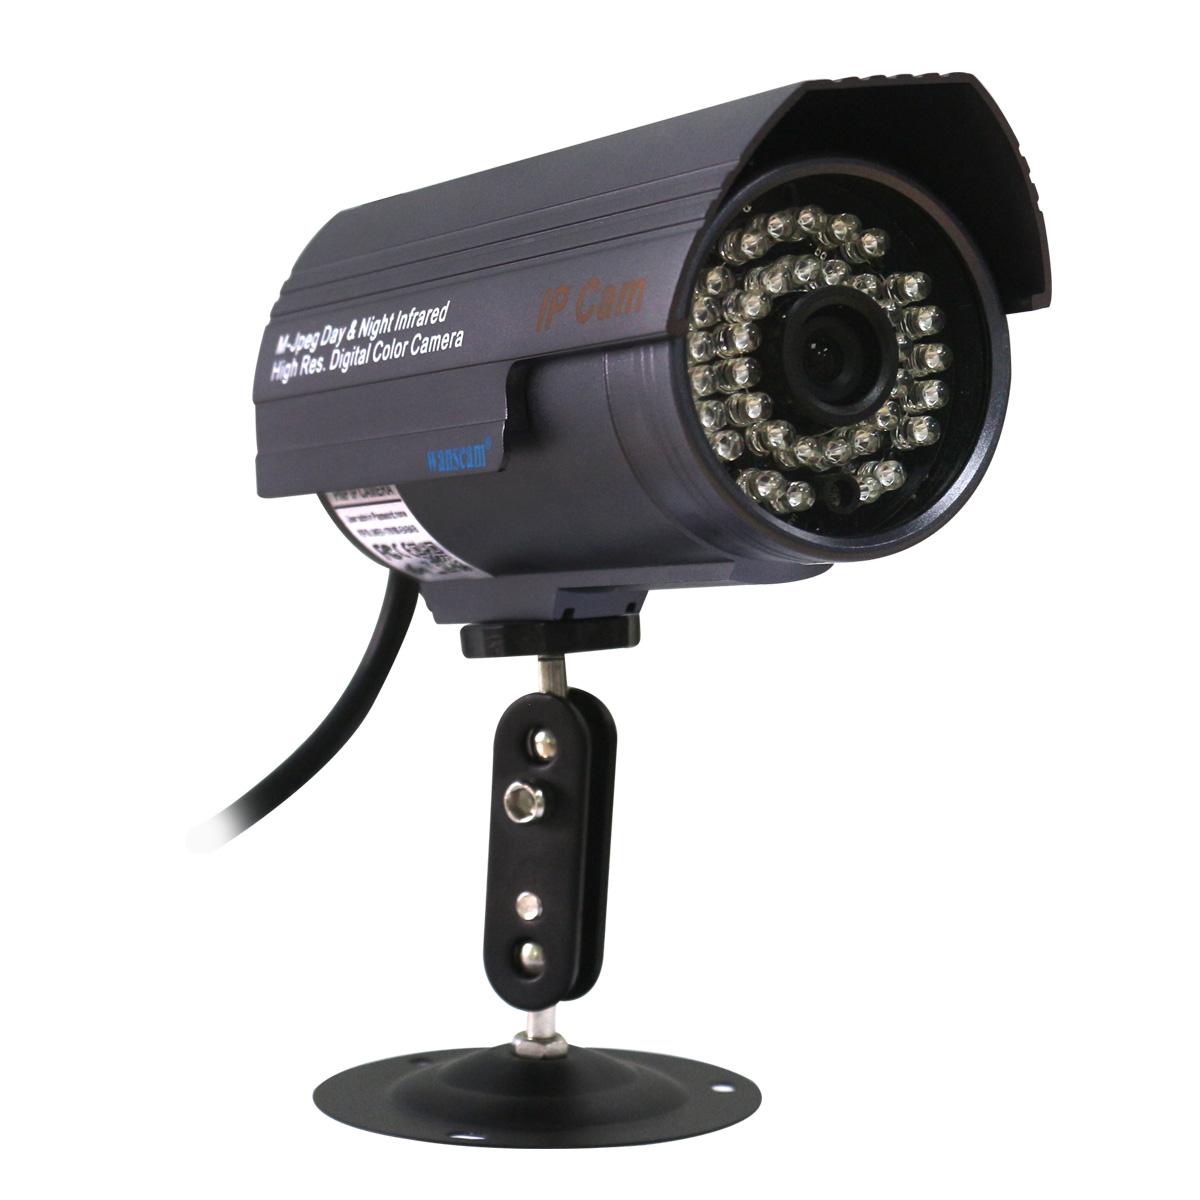 Wanscam wireless p2p surveillance outdoor cheap ip security camera ...